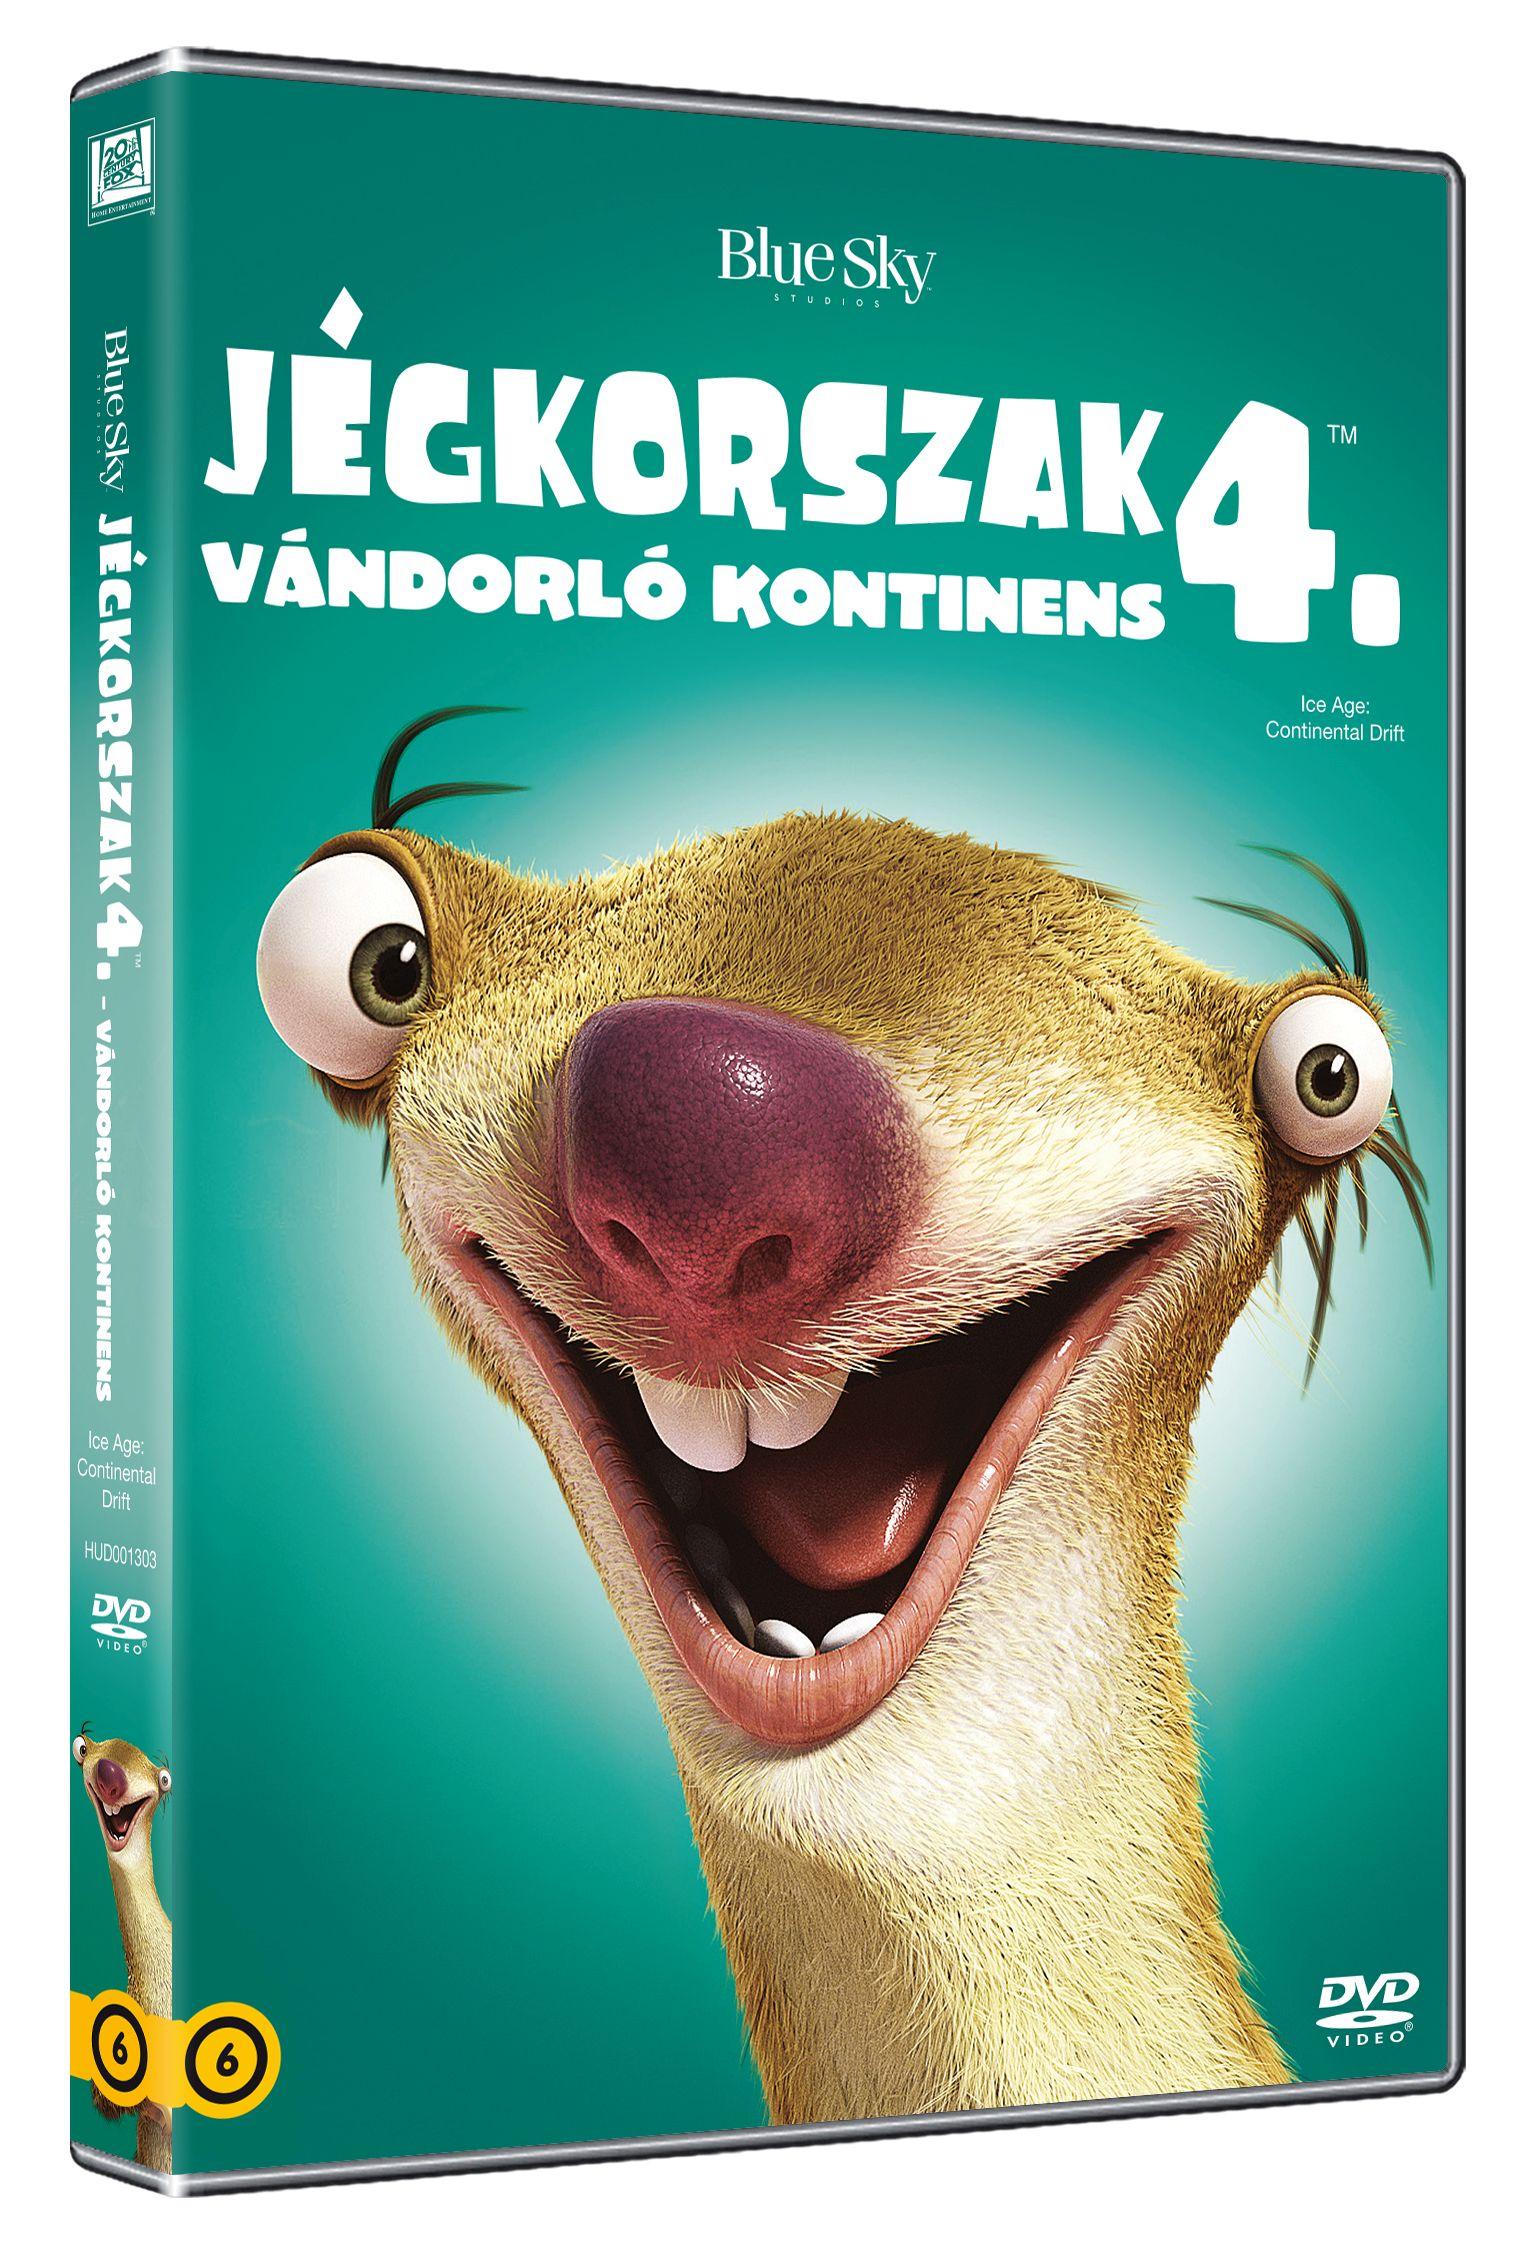 J�gkorszak 4. - V�ndorl� kontinens DVD